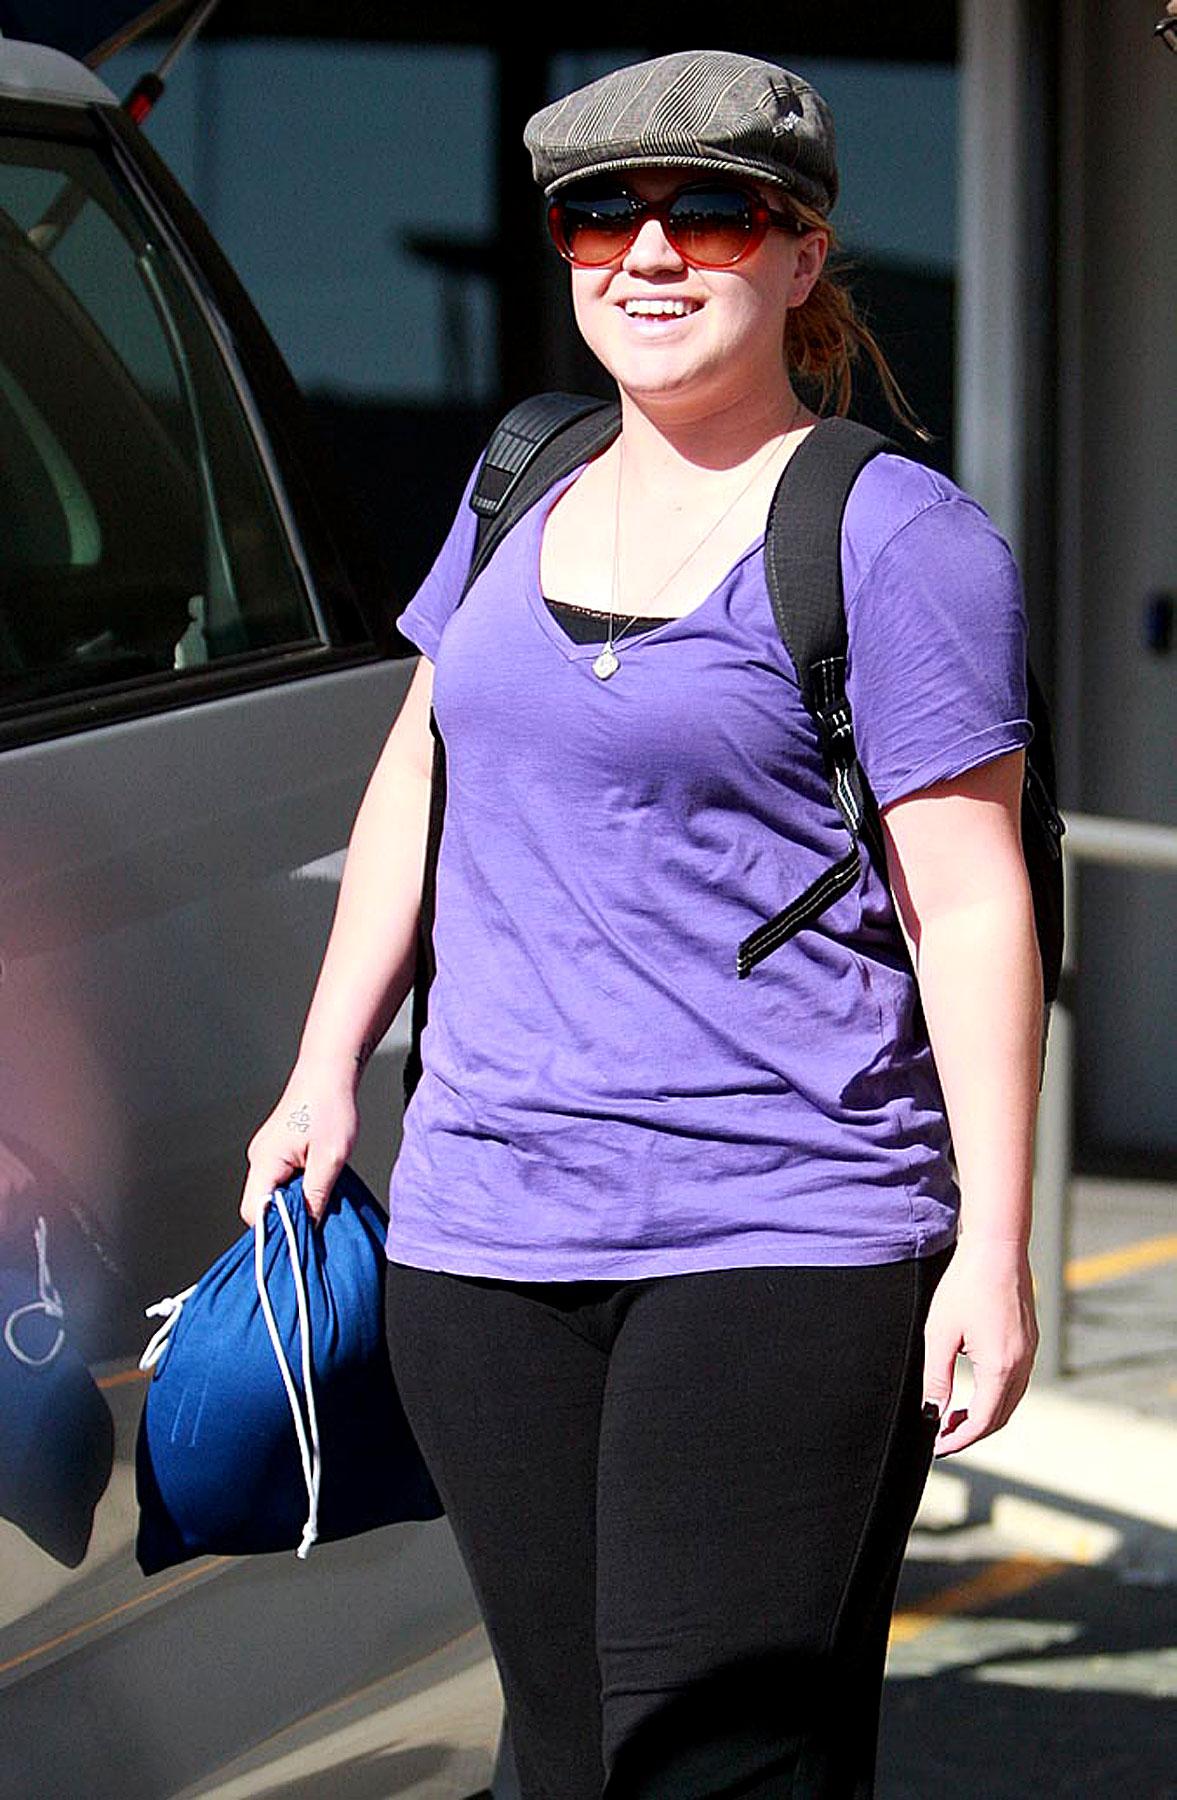 Fashion FAIL: Kelly Clarkson Wants You To Think She's Homeless (PHOTOS)